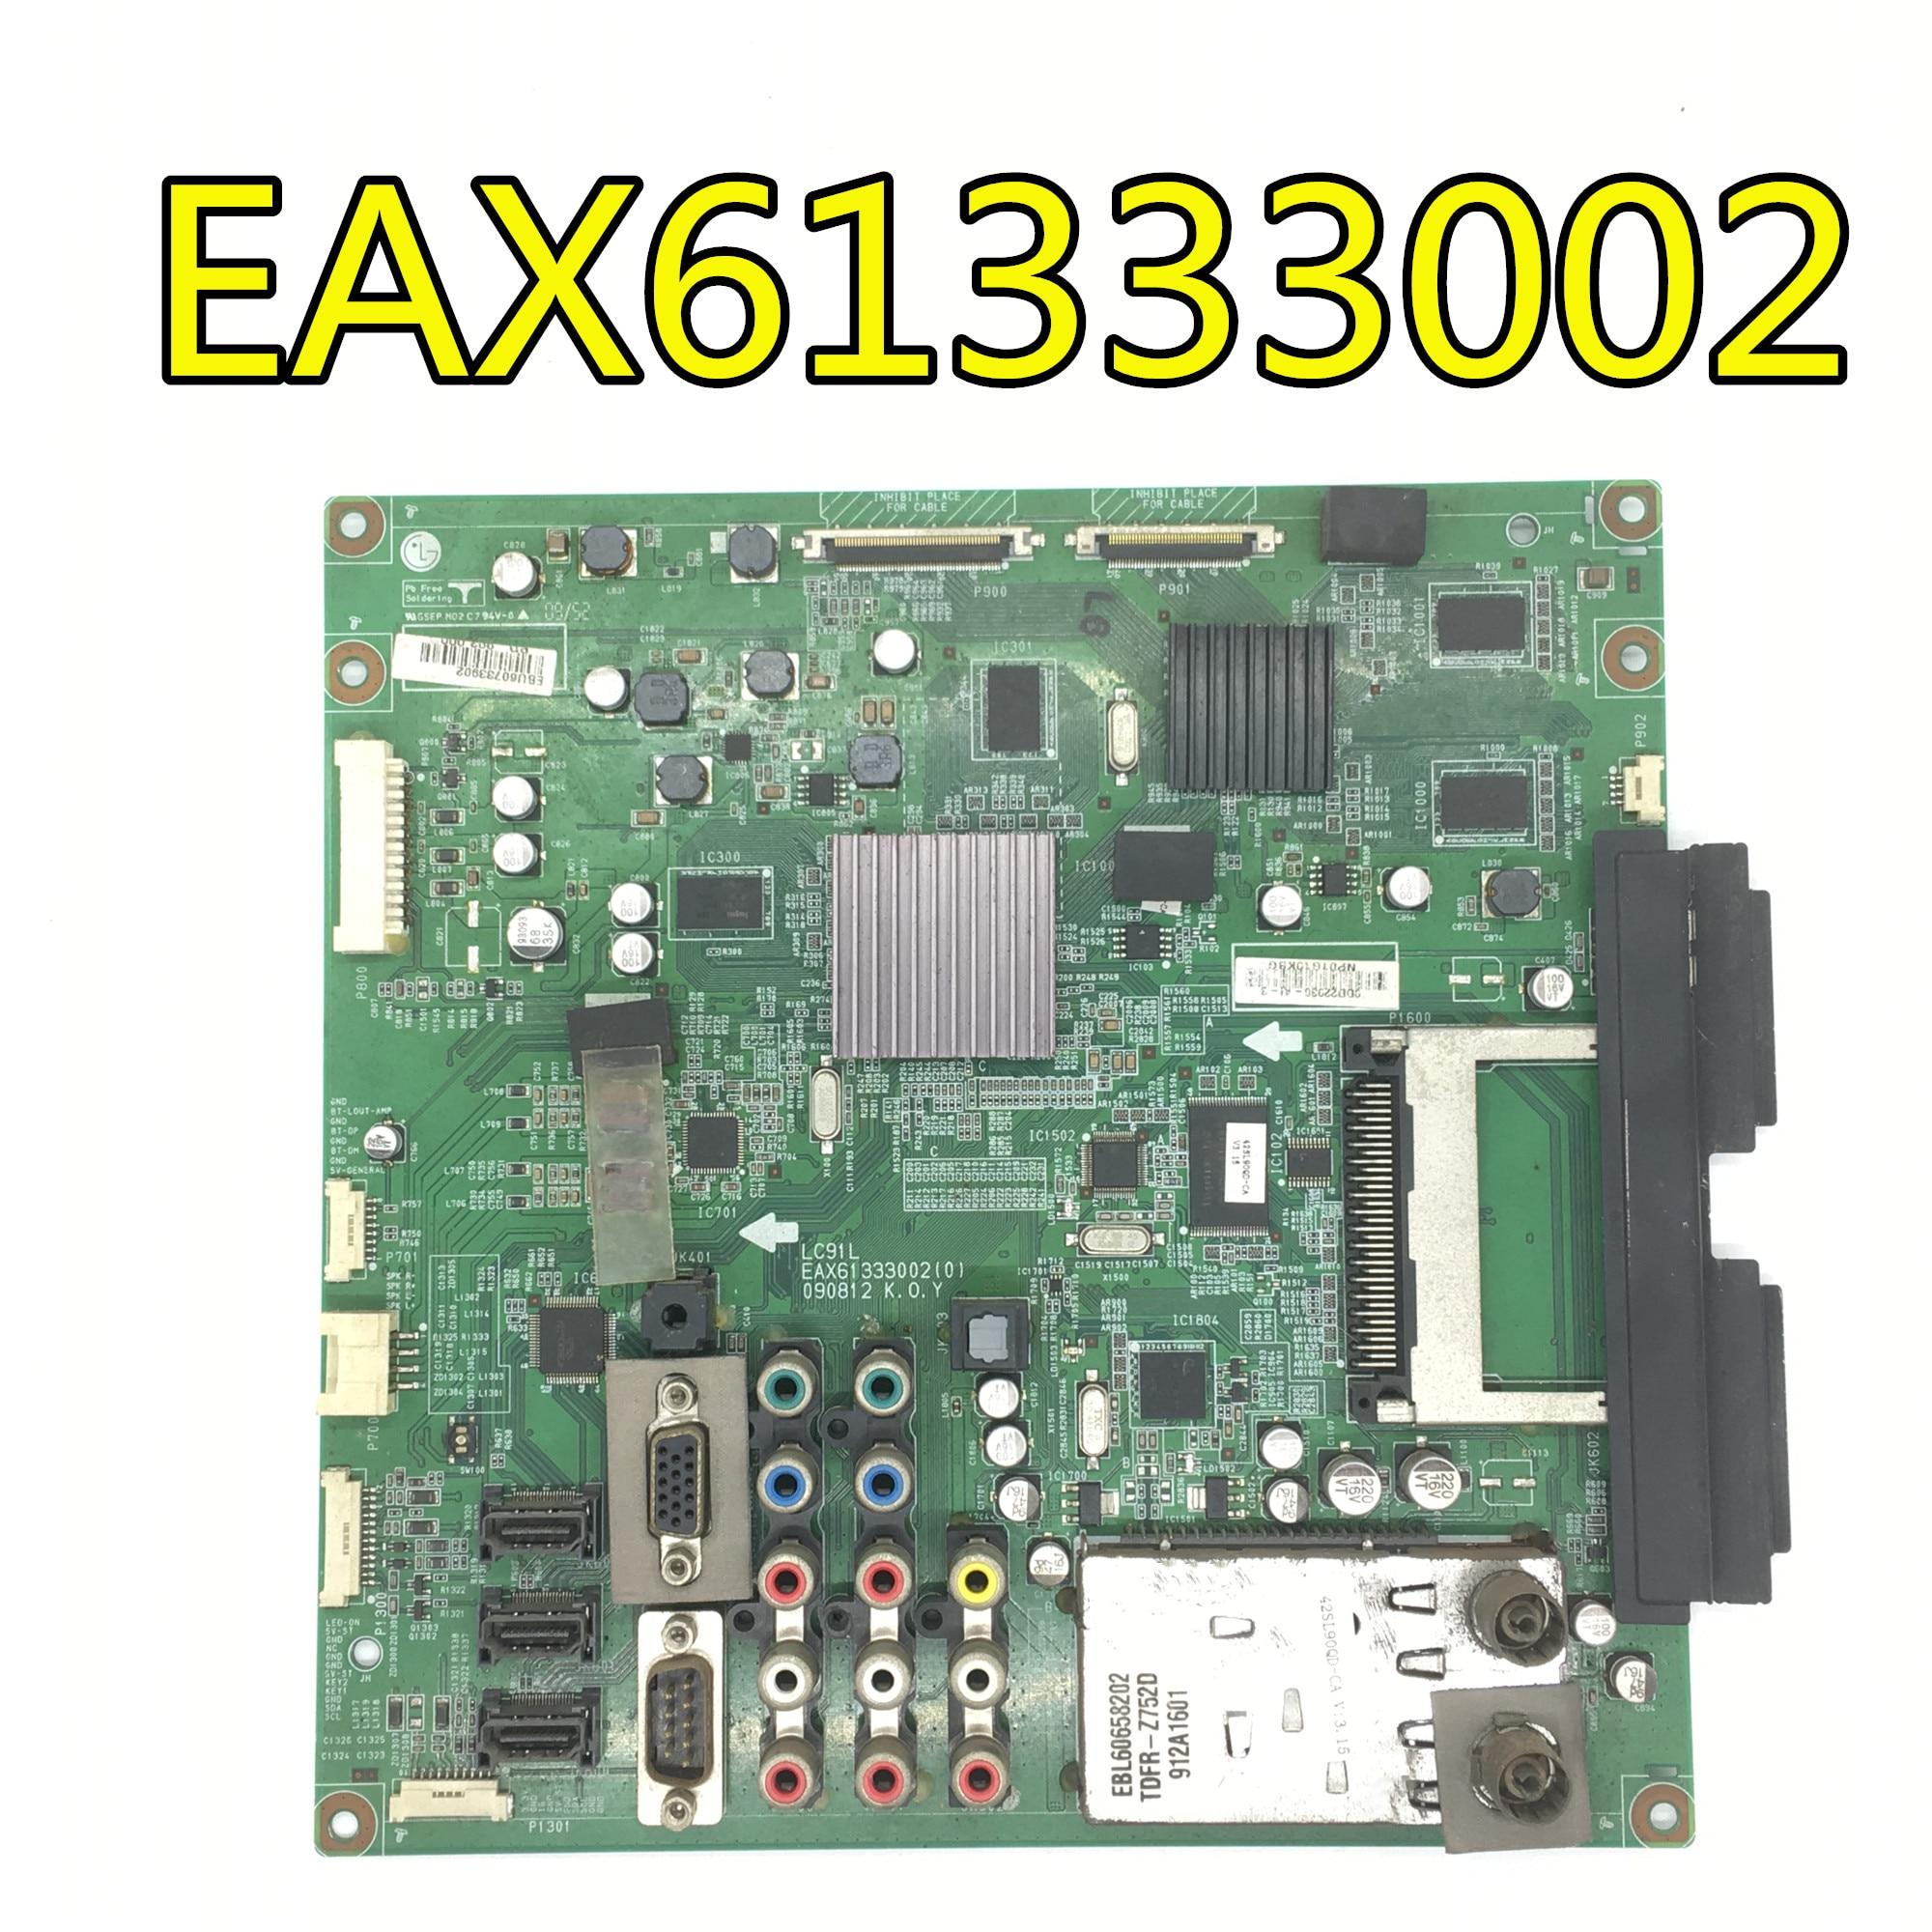 original 100% test for LG 42SL90QD 47SL90QD motherboard EAX61333002 LC420WULoriginal 100% test for LG 42SL90QD 47SL90QD motherboard EAX61333002 LC420WUL